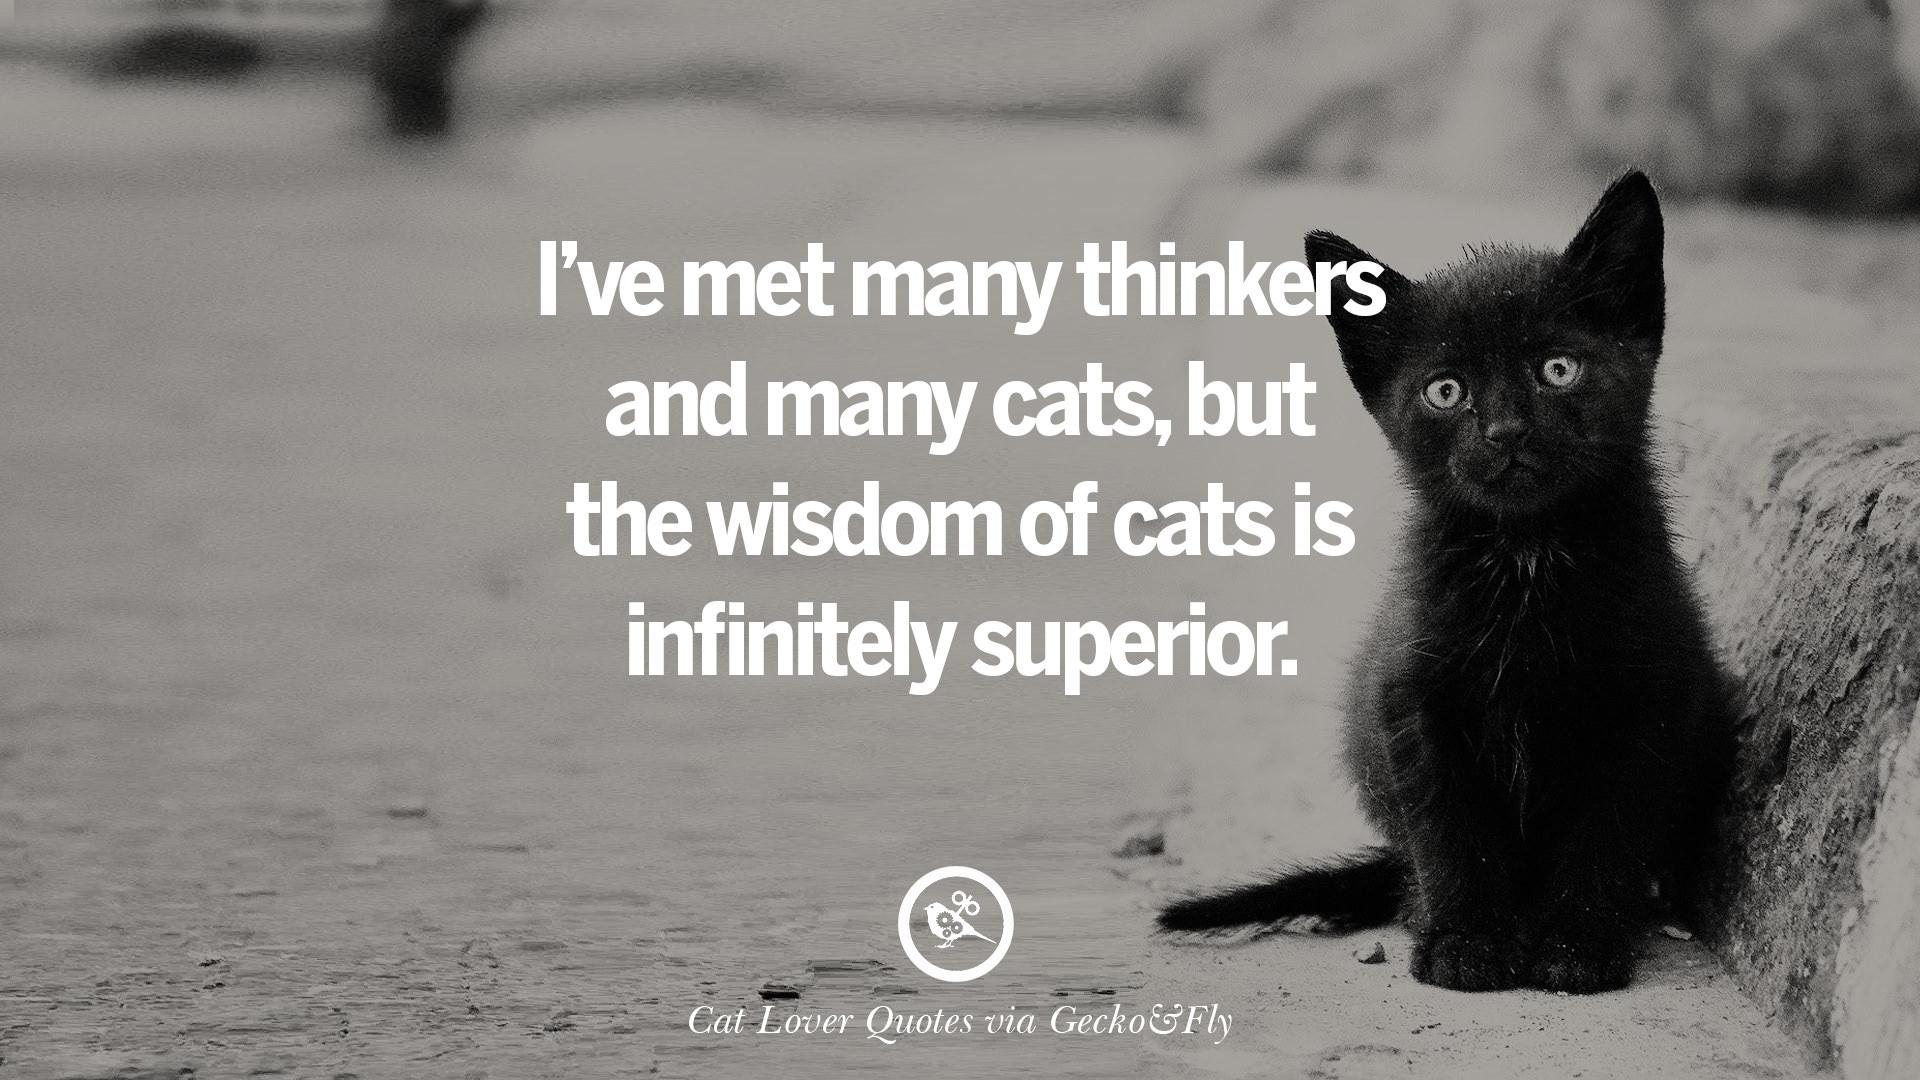 25 Cute Cat Images With Quotes For Crazy Cat Ladies ...